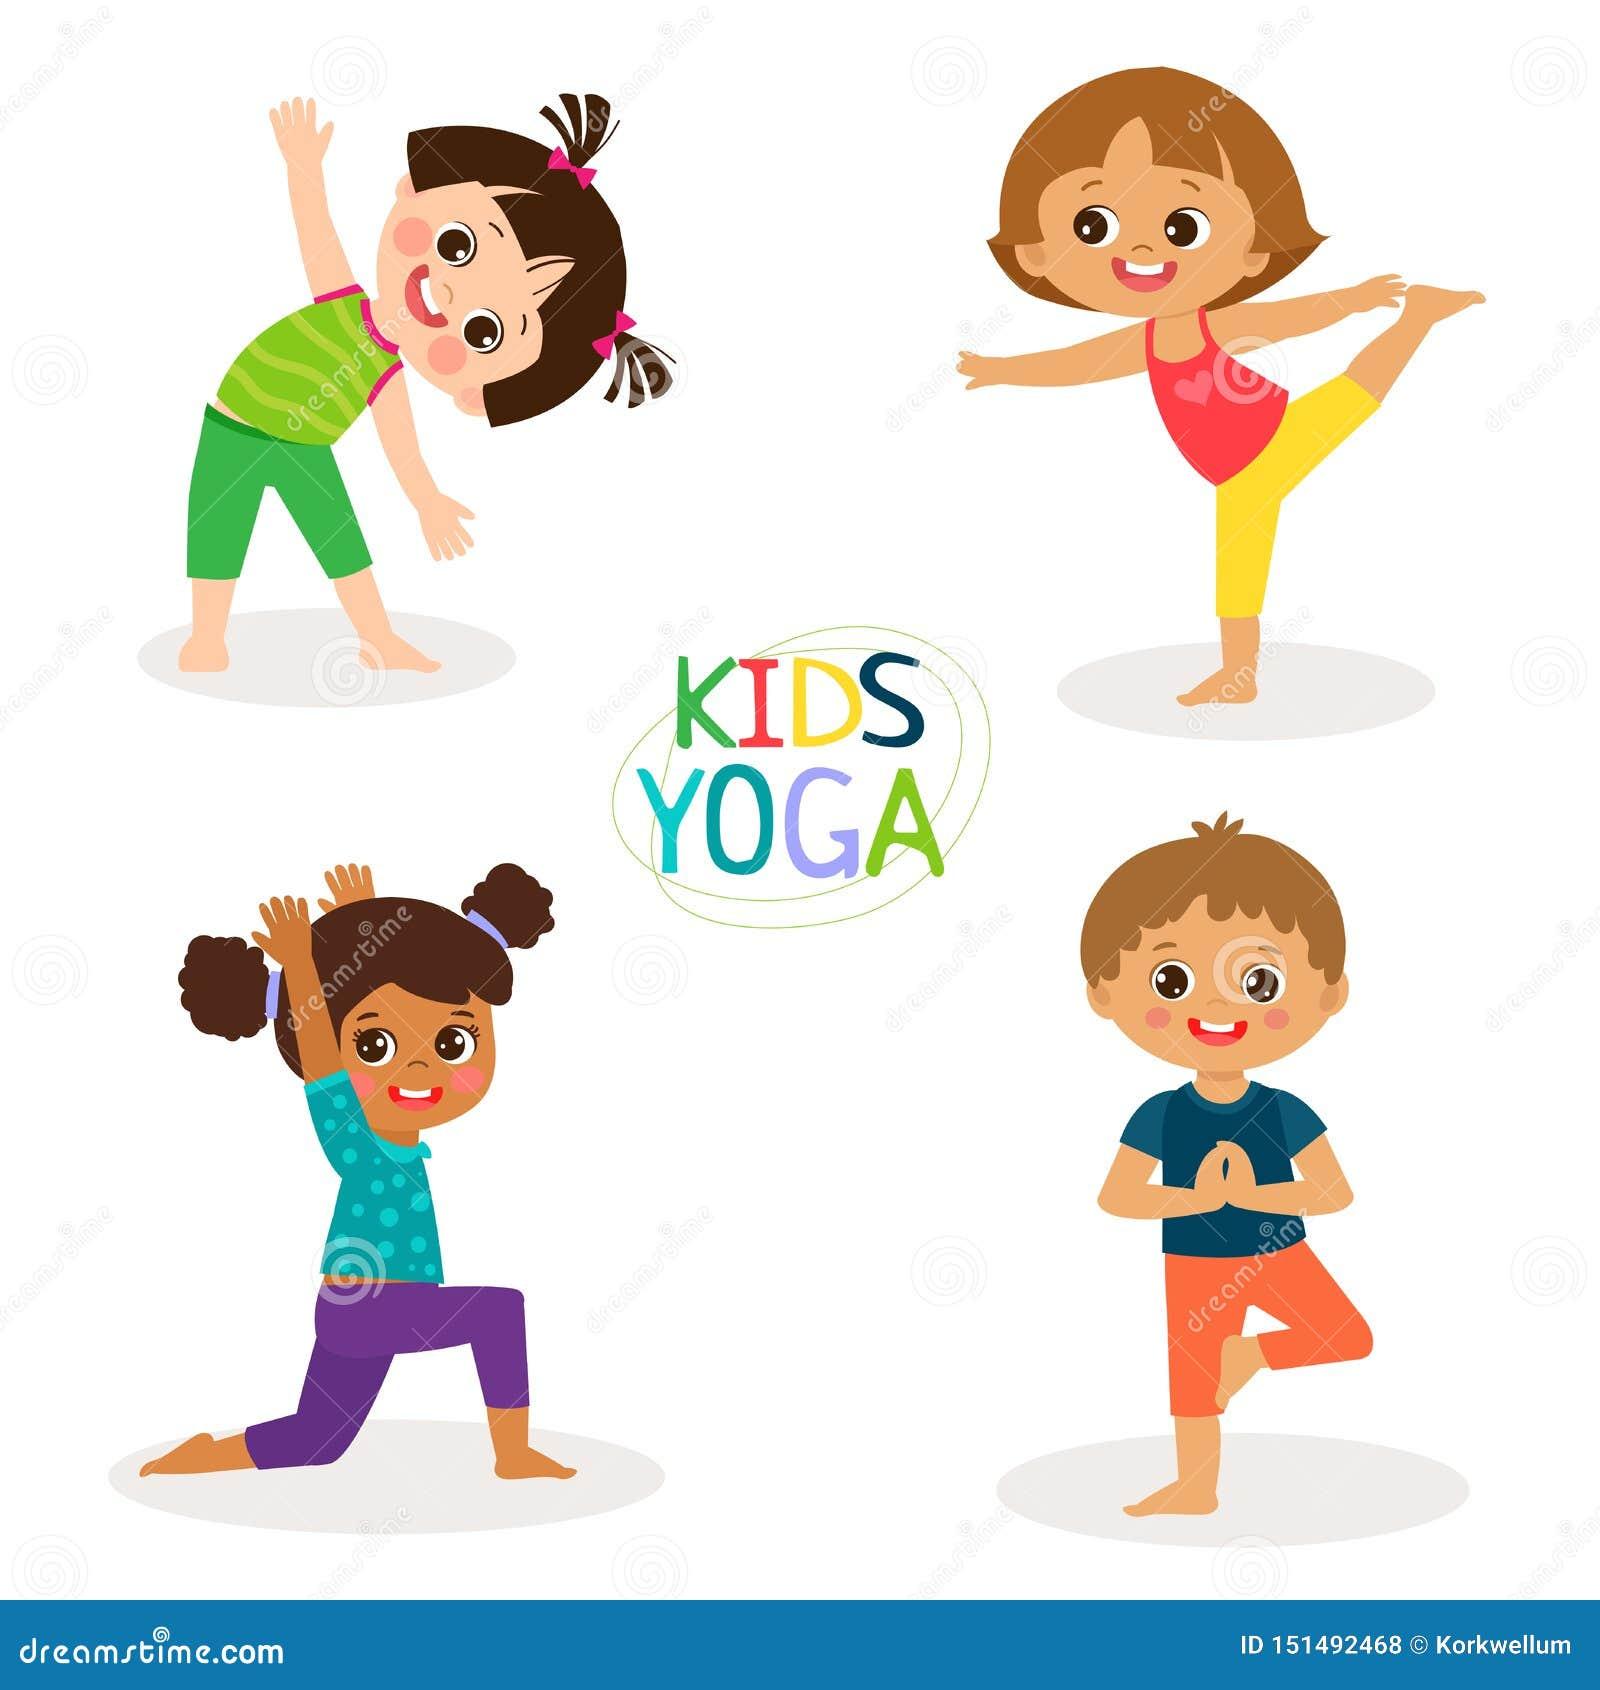 Yoga Poses Kids Stock Illustrations 273 Yoga Poses Kids Stock Illustrations Vectors Clipart Dreamstime